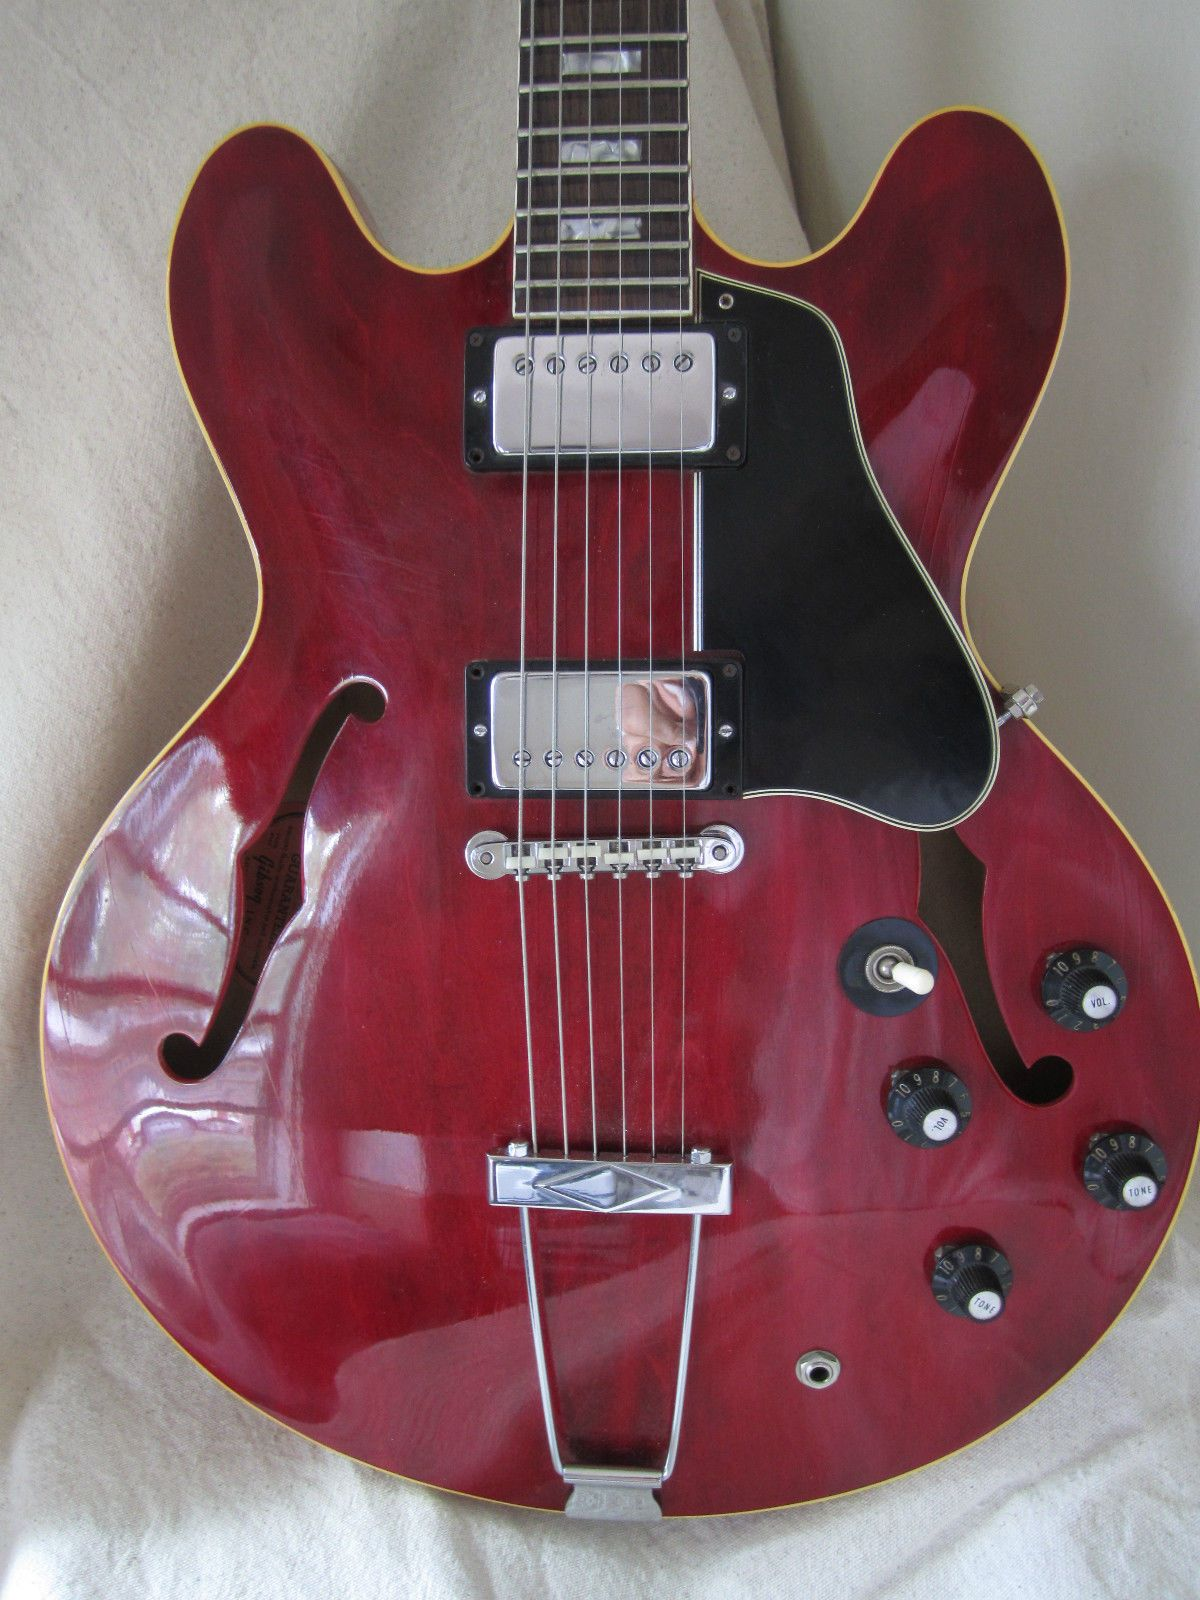 1967 Gibson Es 335 Vintage Electric Guitar Excellent Condition